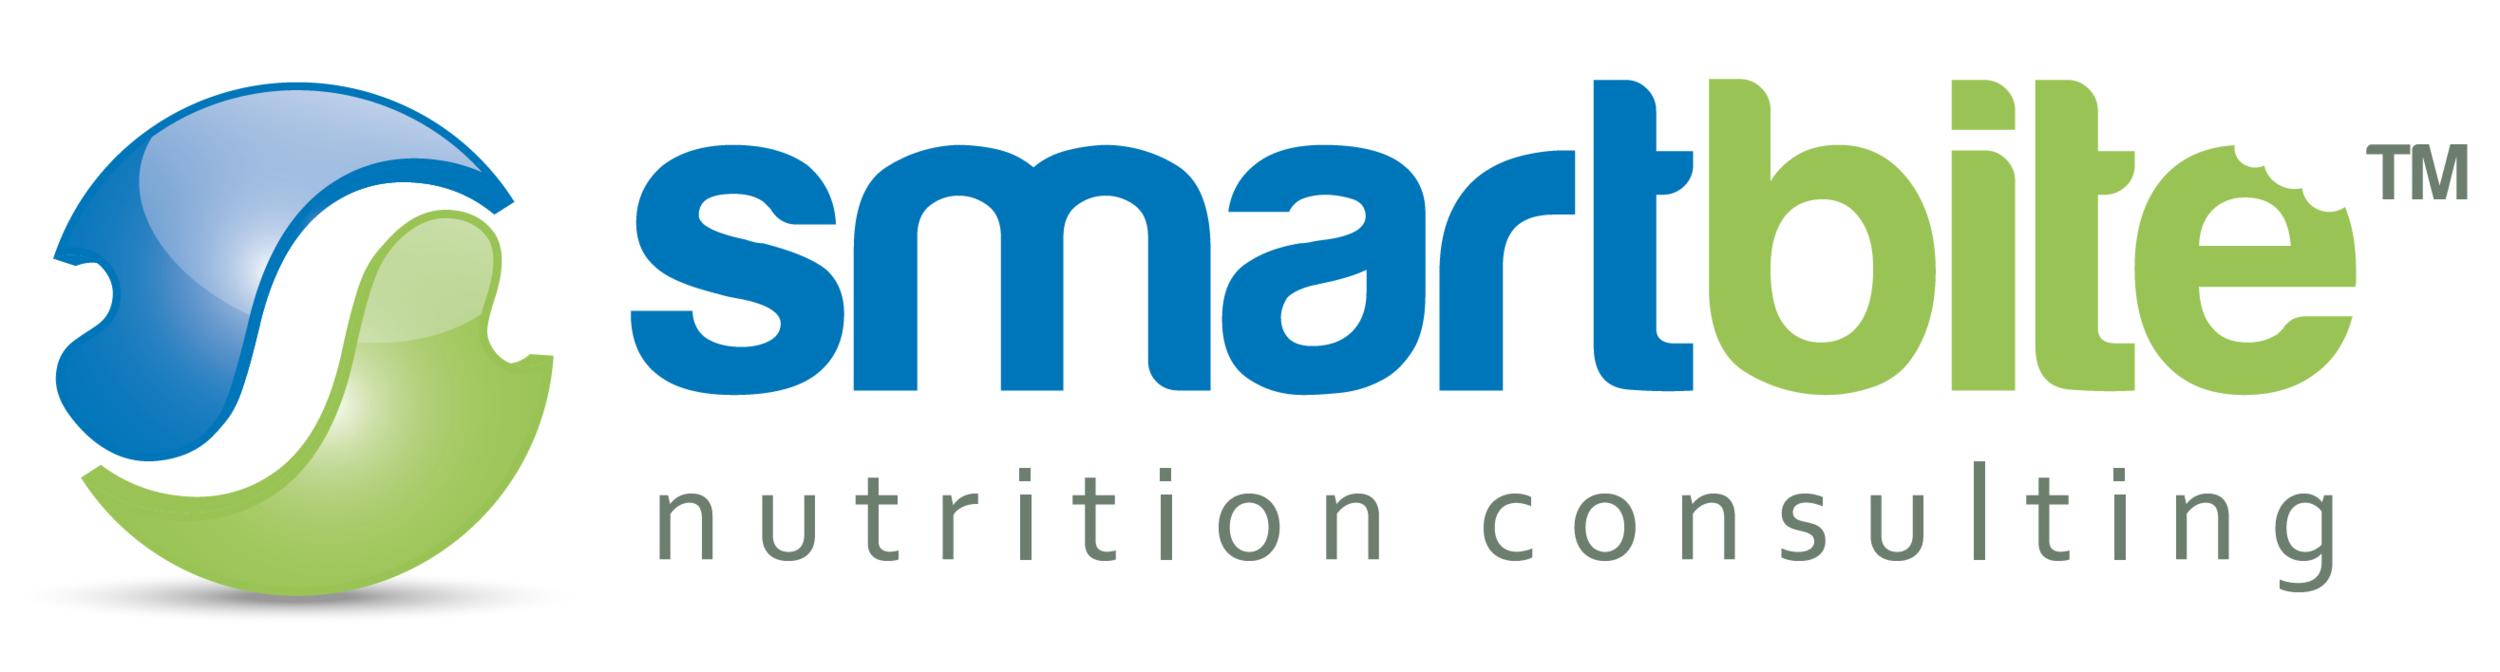 Smarbite Logo.png